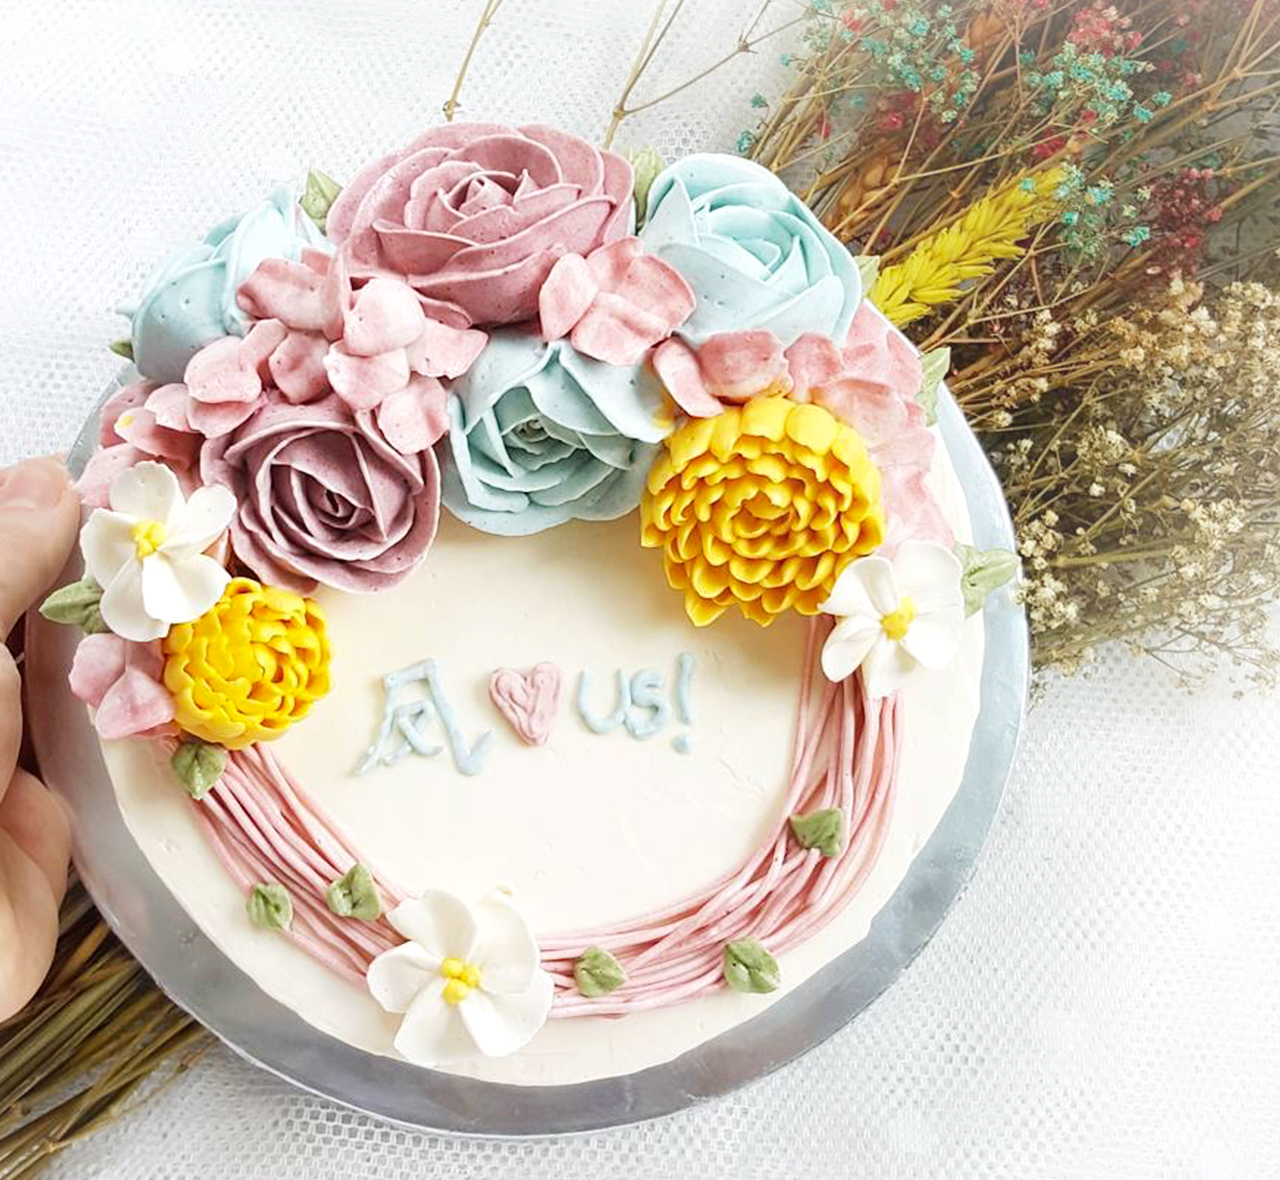 Floral Birthday Cake Design 2 The Premium Made To Order Cake